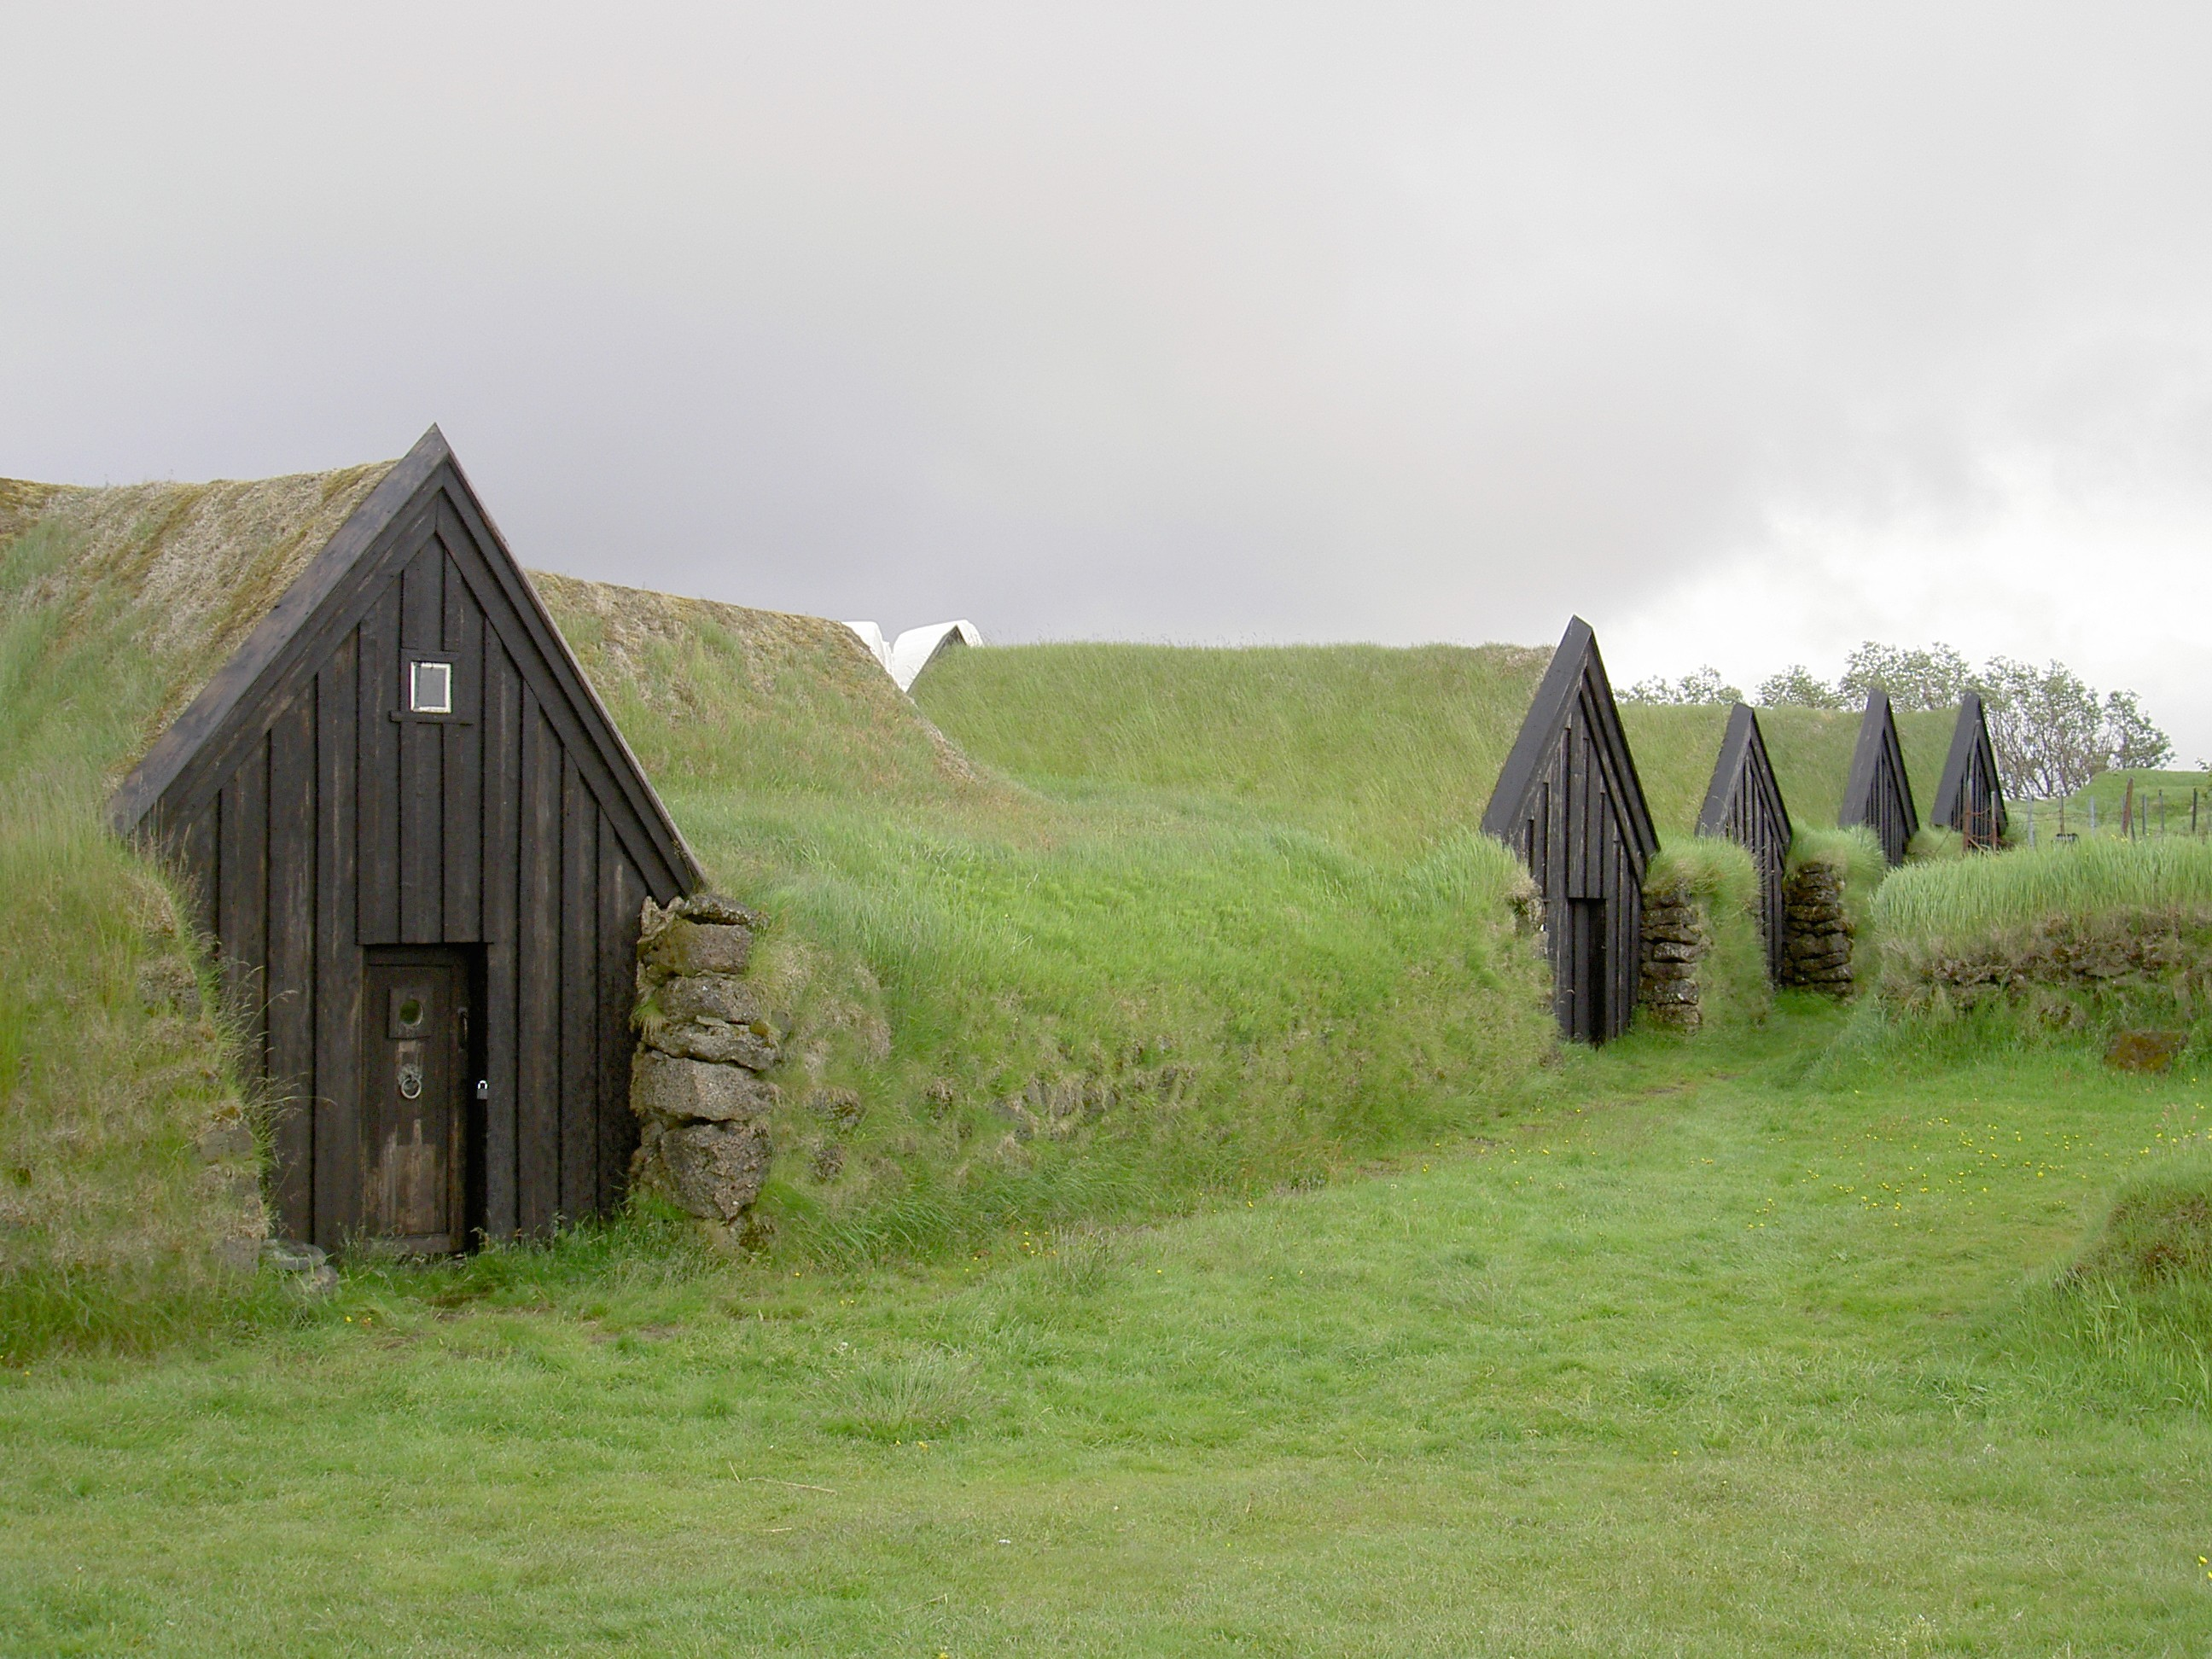 Earth Covered Homes In Keldur Farm Iceland